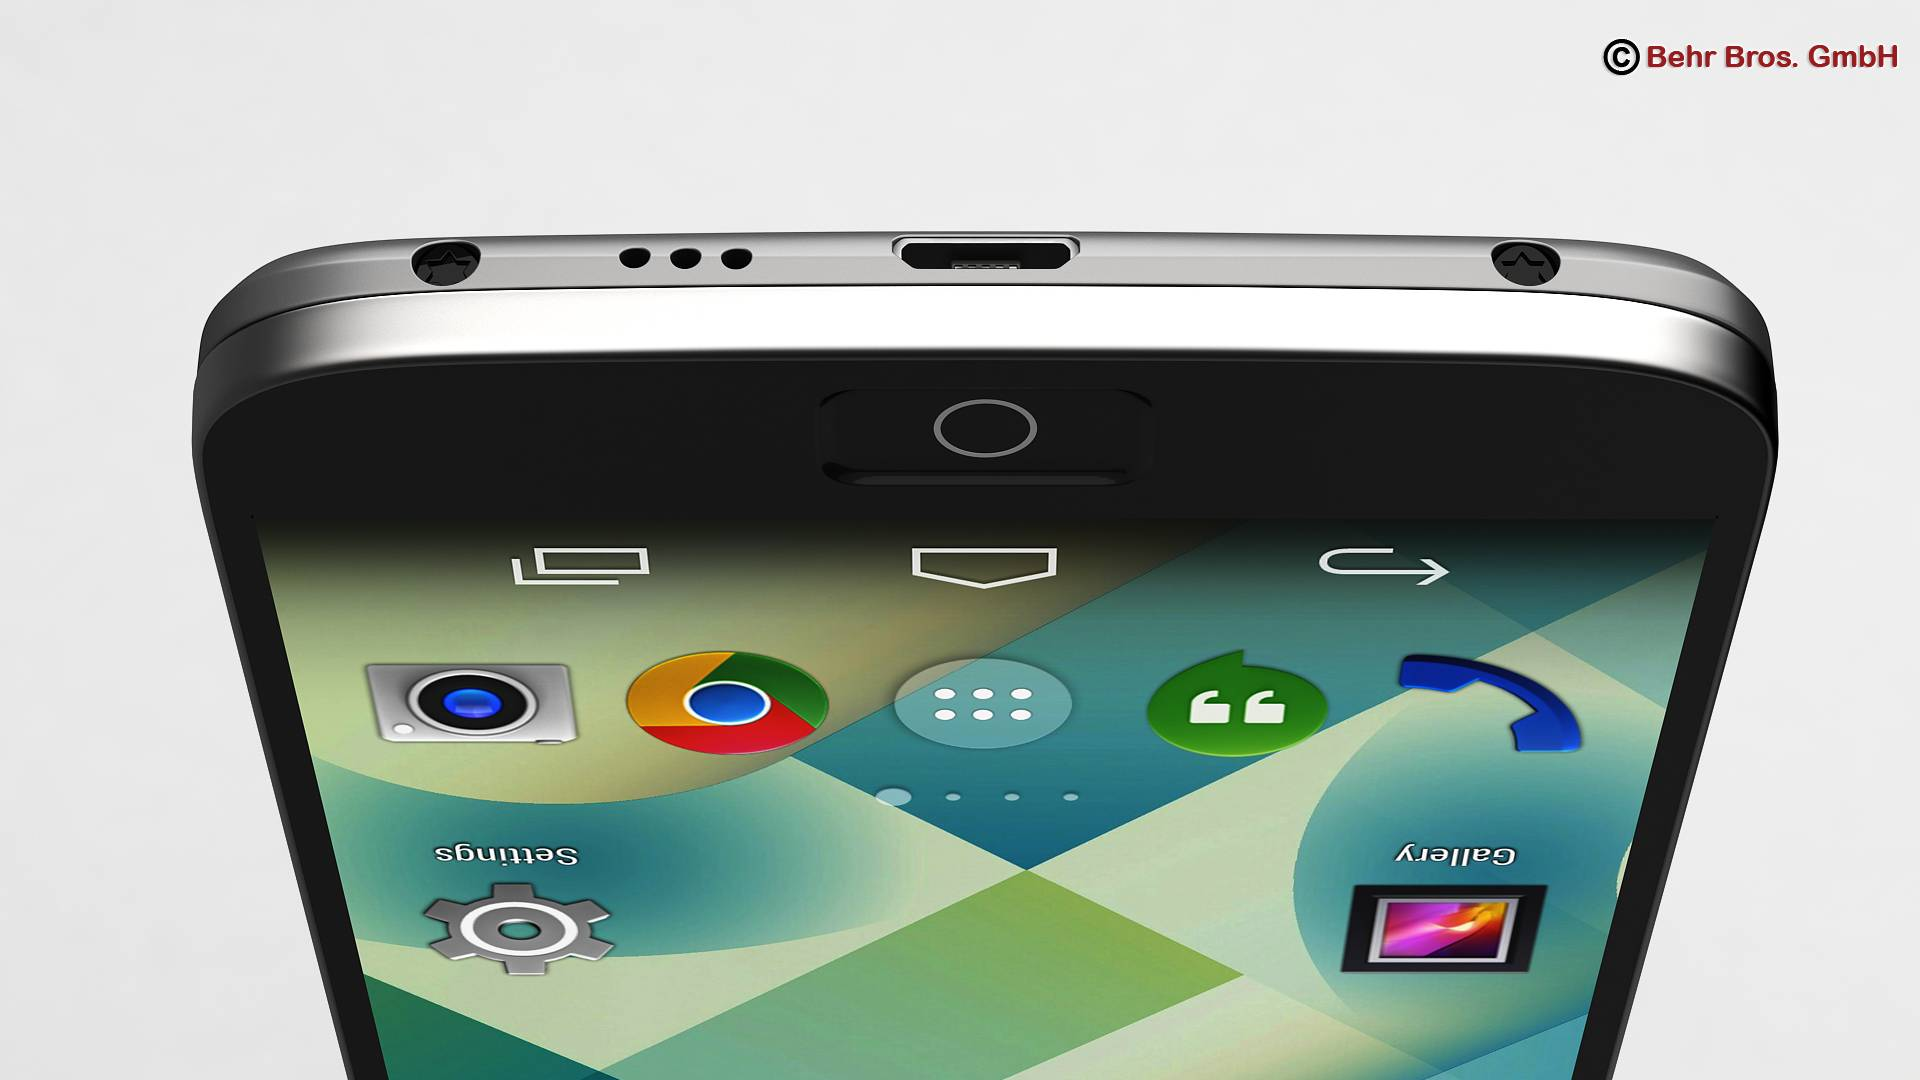 generic smartphone 5.2 inch 3d model 3ds max fbx c4d lwo ma mb obj 161652